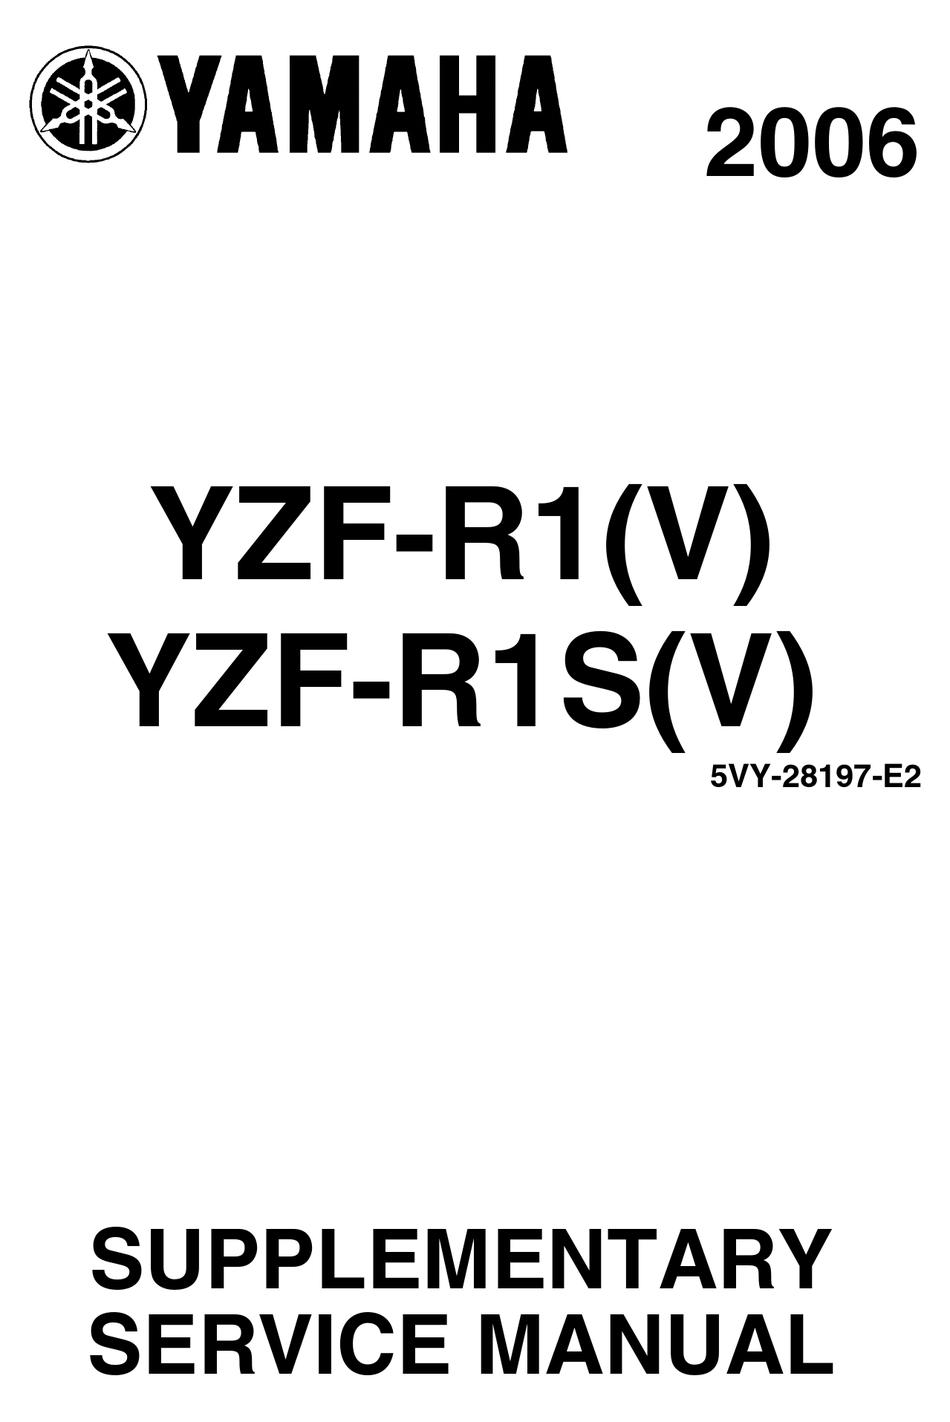 yamaha 2006 ysf-r1(v) supplementary service manual pdf download | manualslib  manualslib